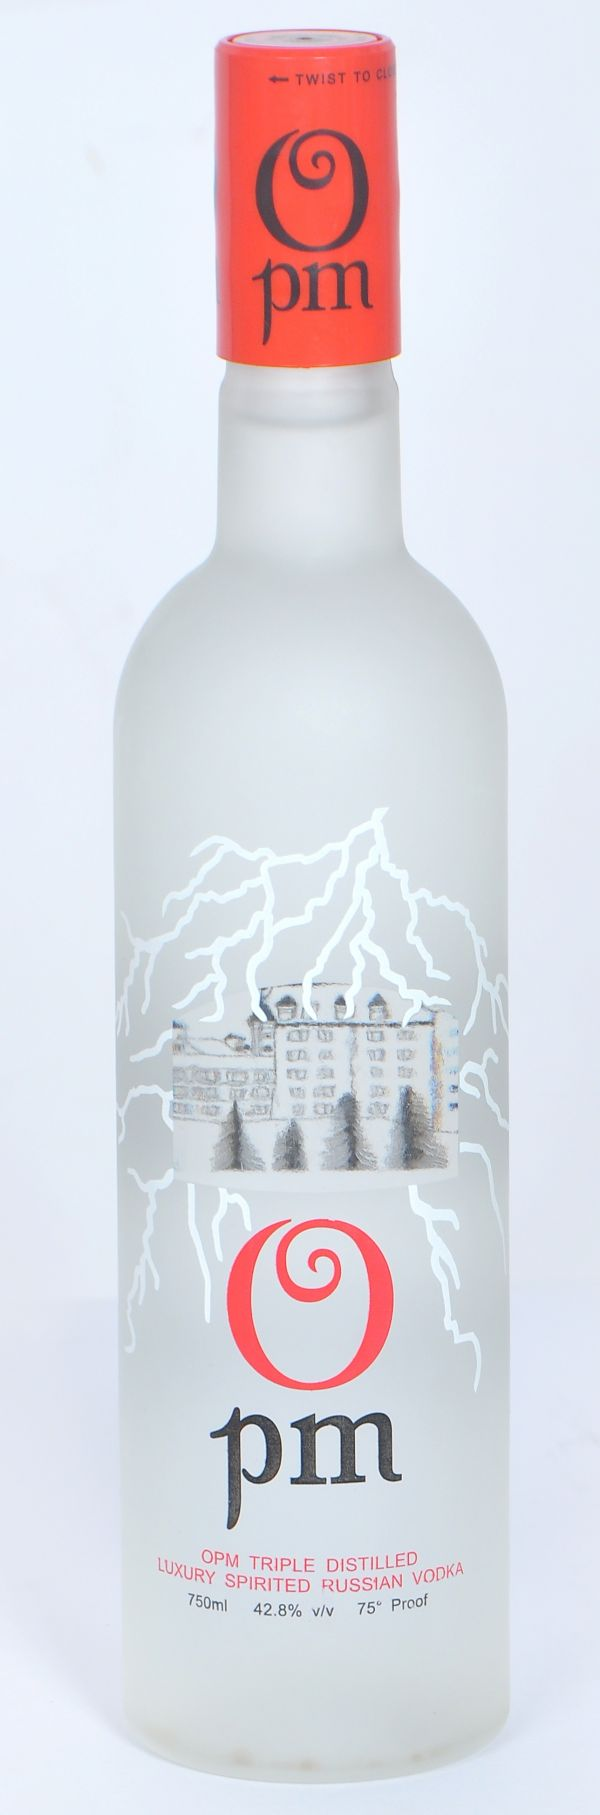 OPM Vodka.jpg